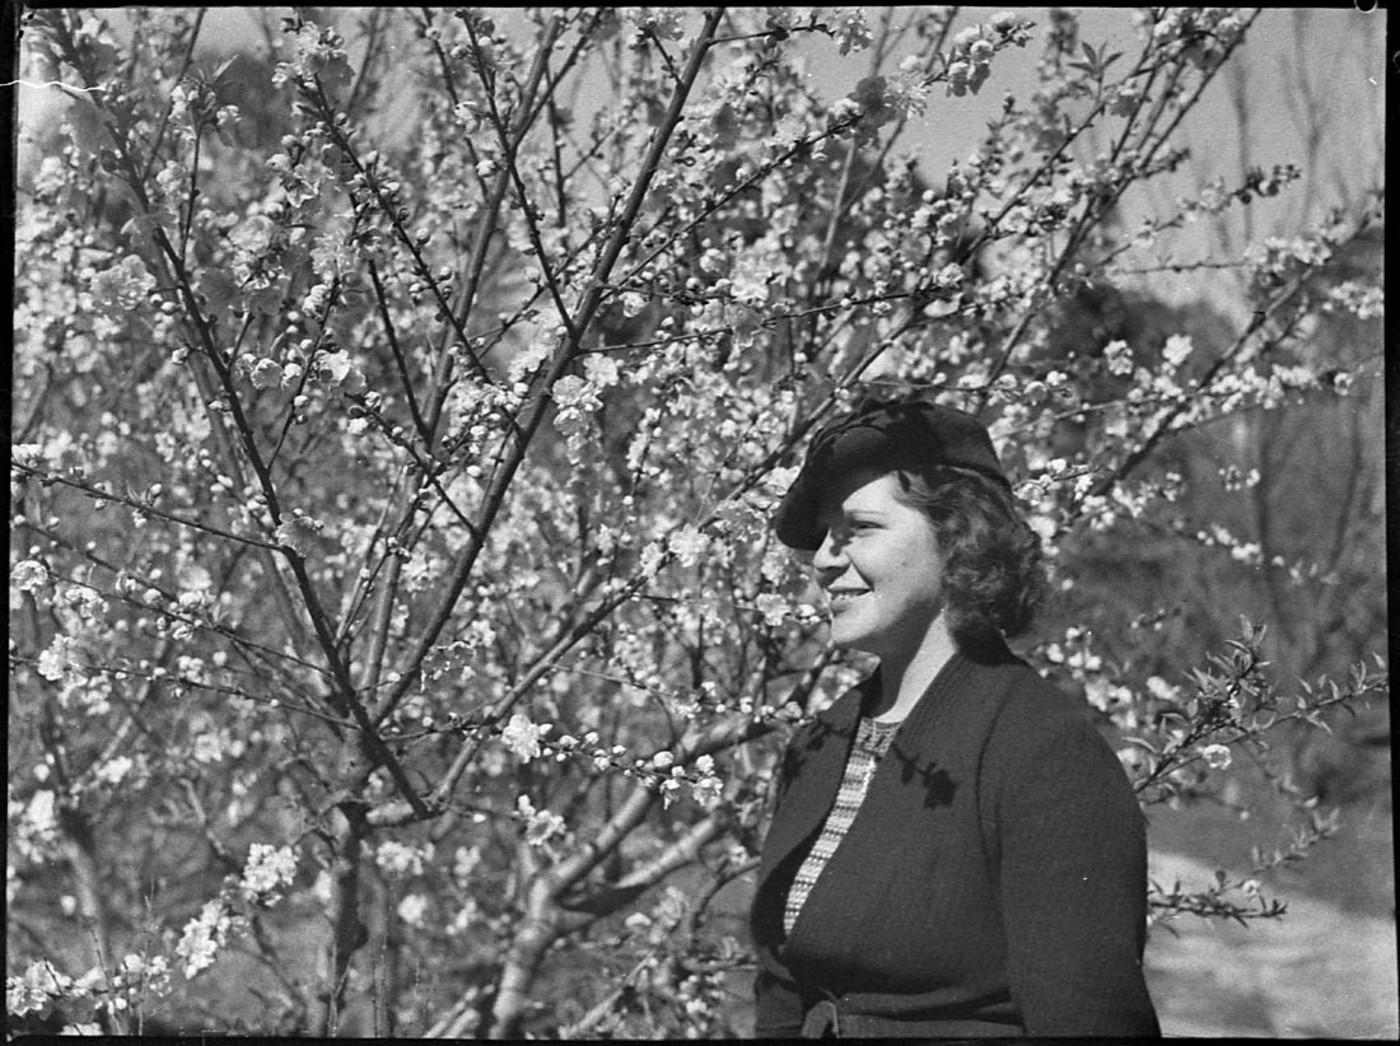 View in Botanic Gardens, October 1938, by Sam Hood